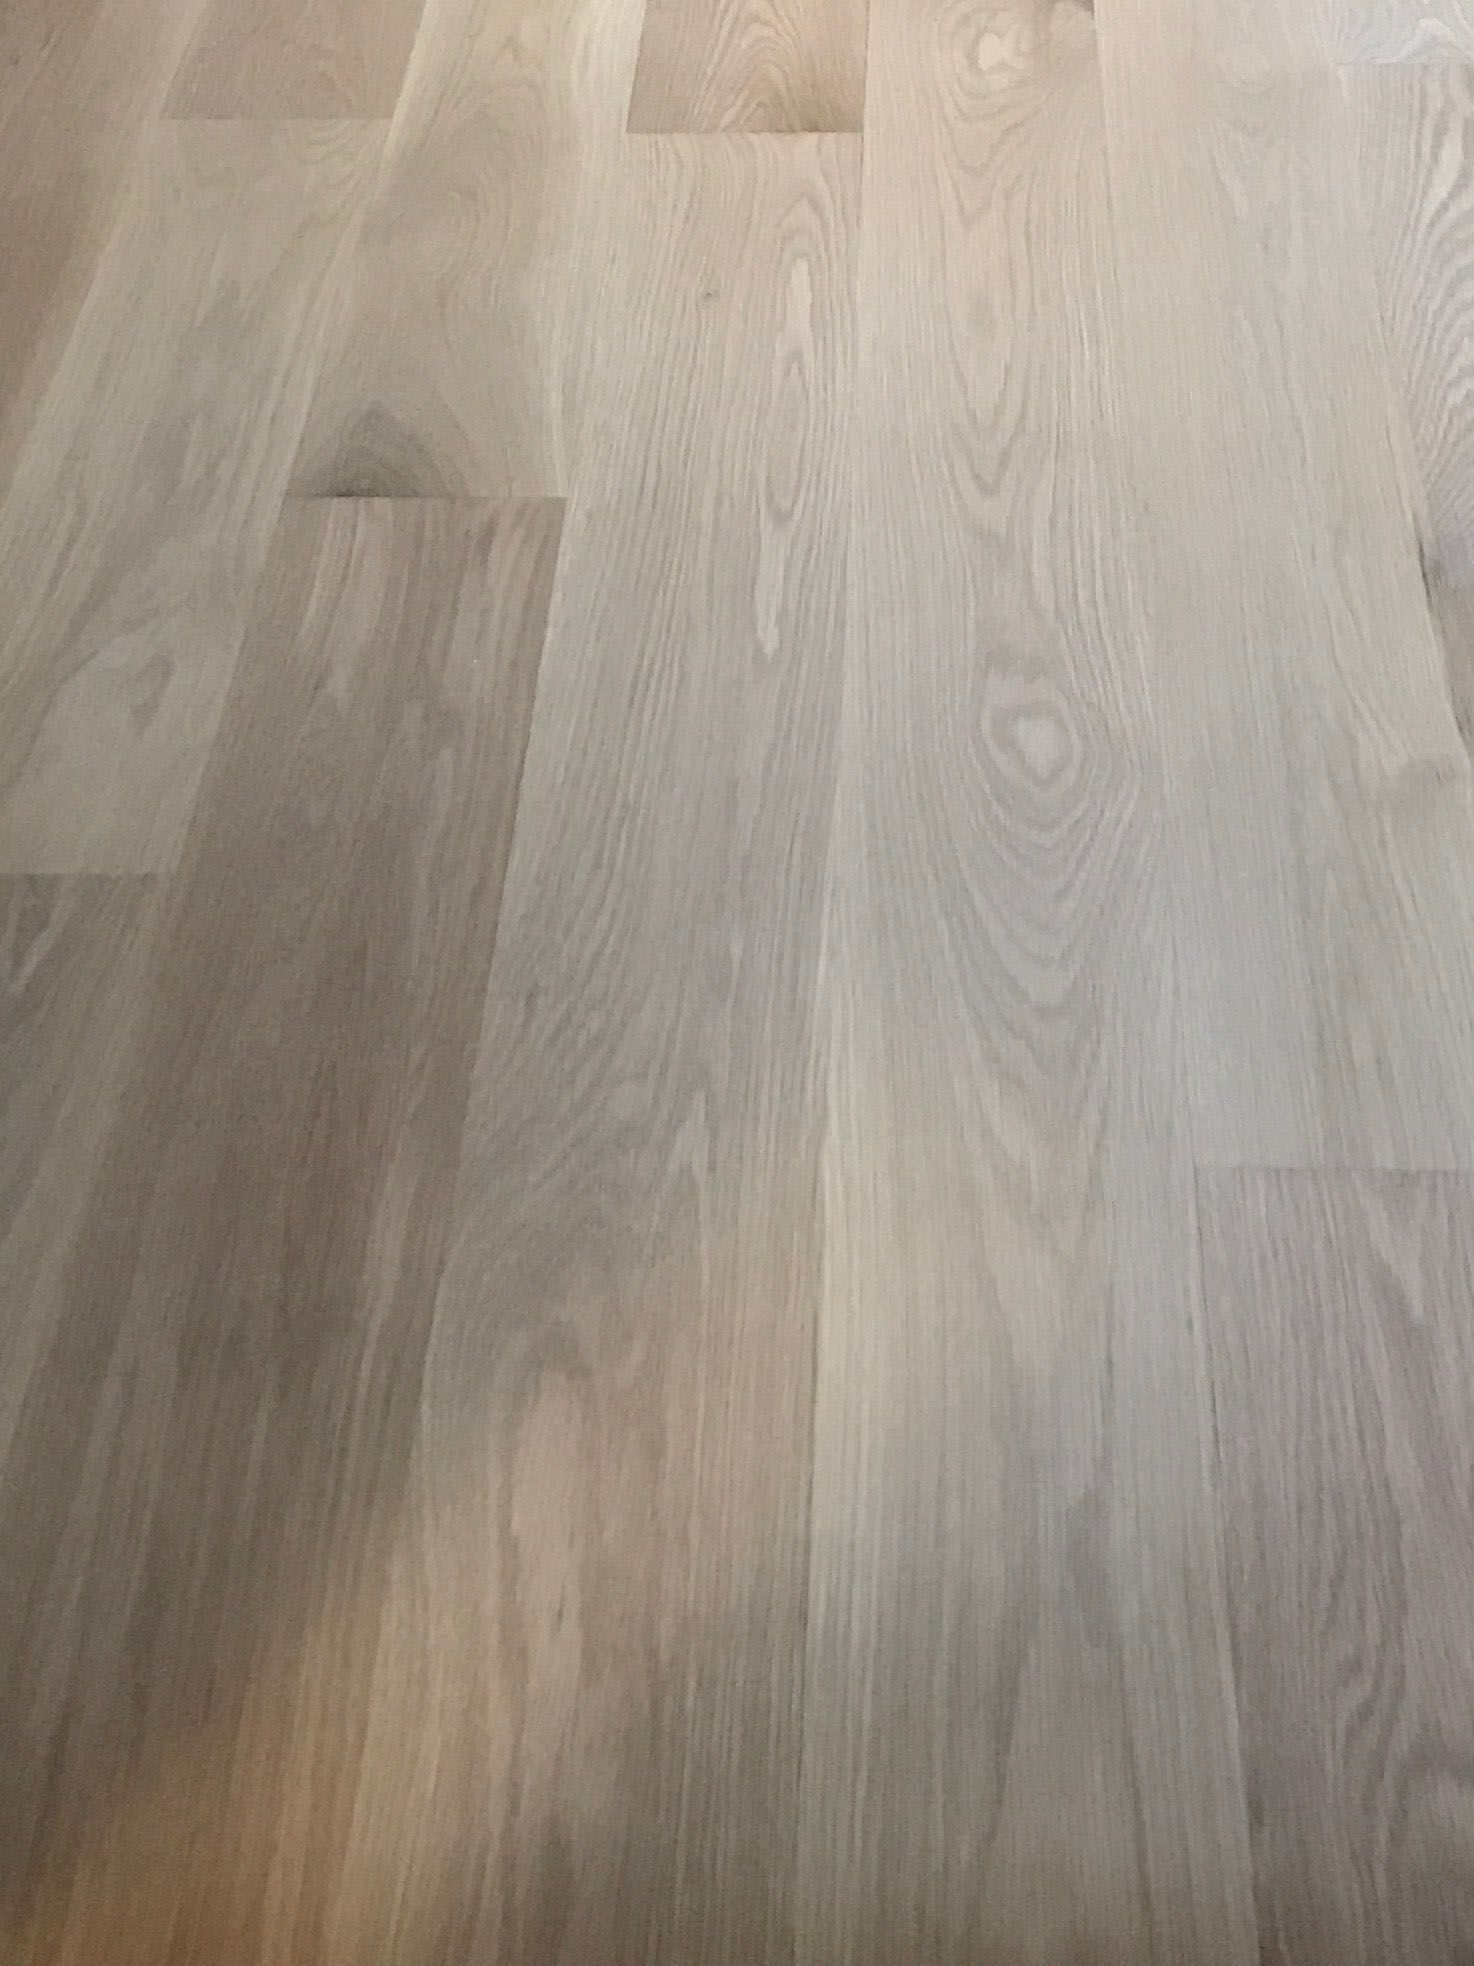 7 Advantages Of White Oak Hardwood Flooring Floors Oak